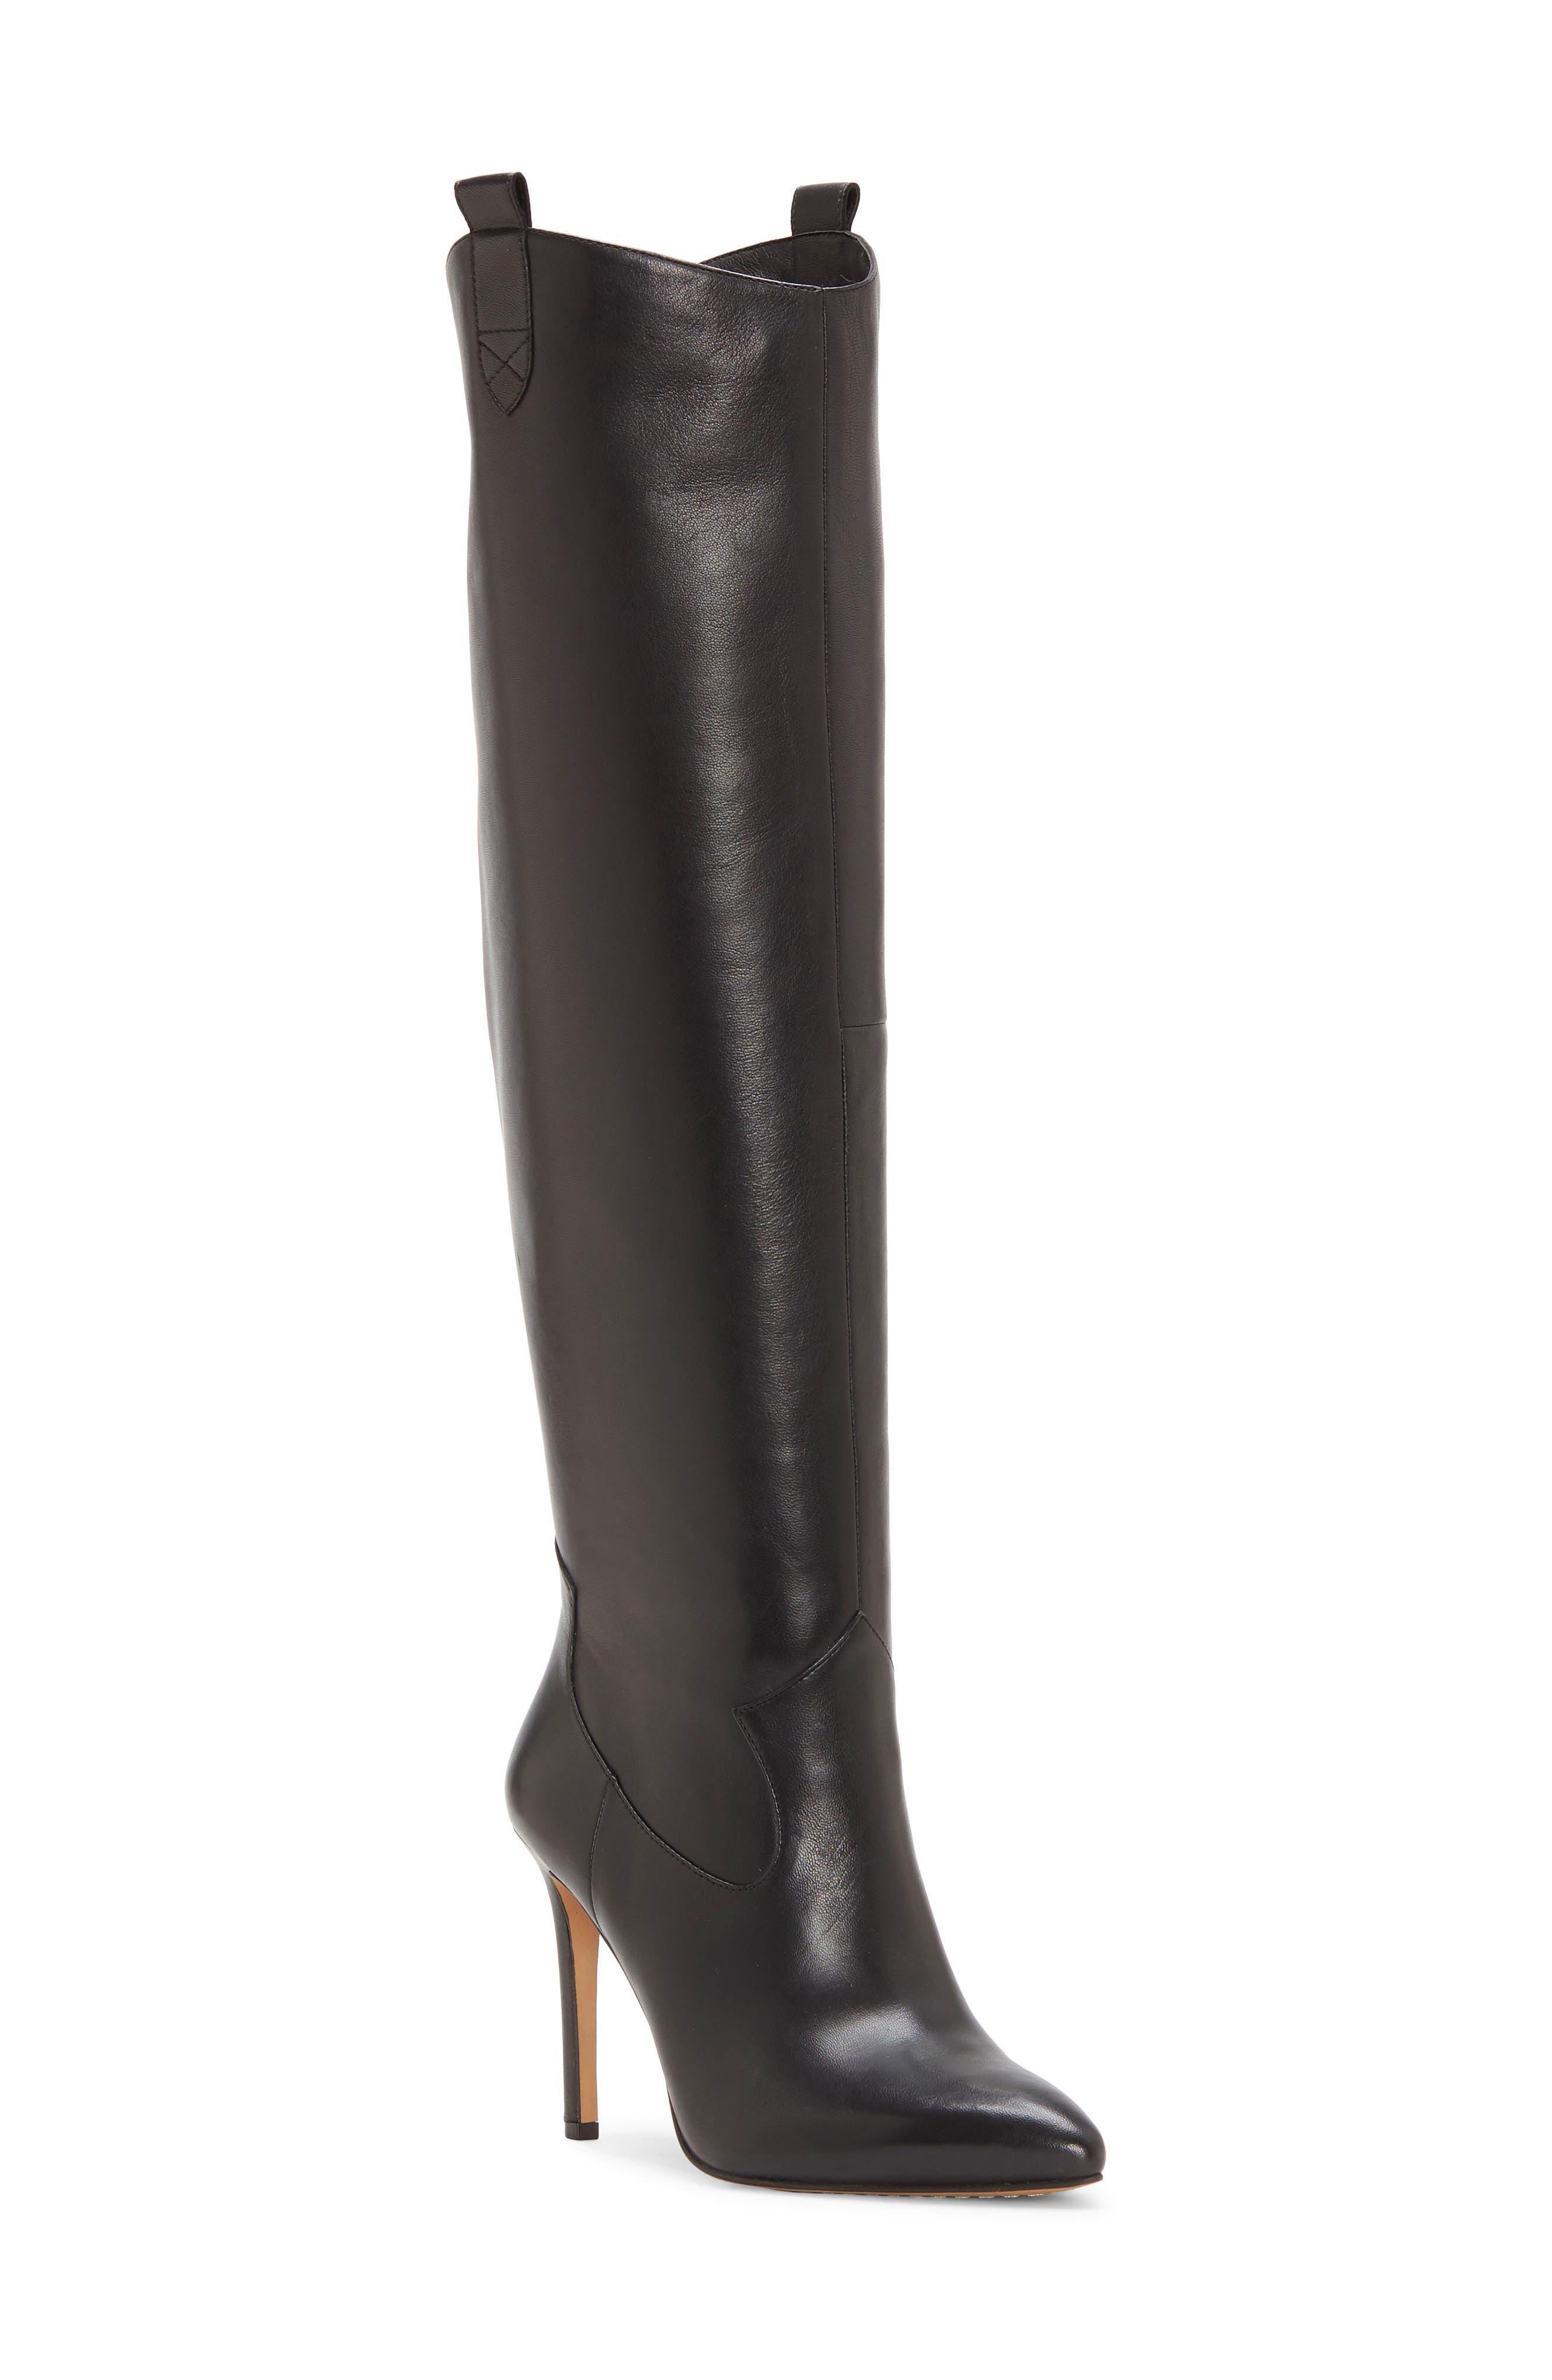 Kervana Embossed Knee High Leather Boot